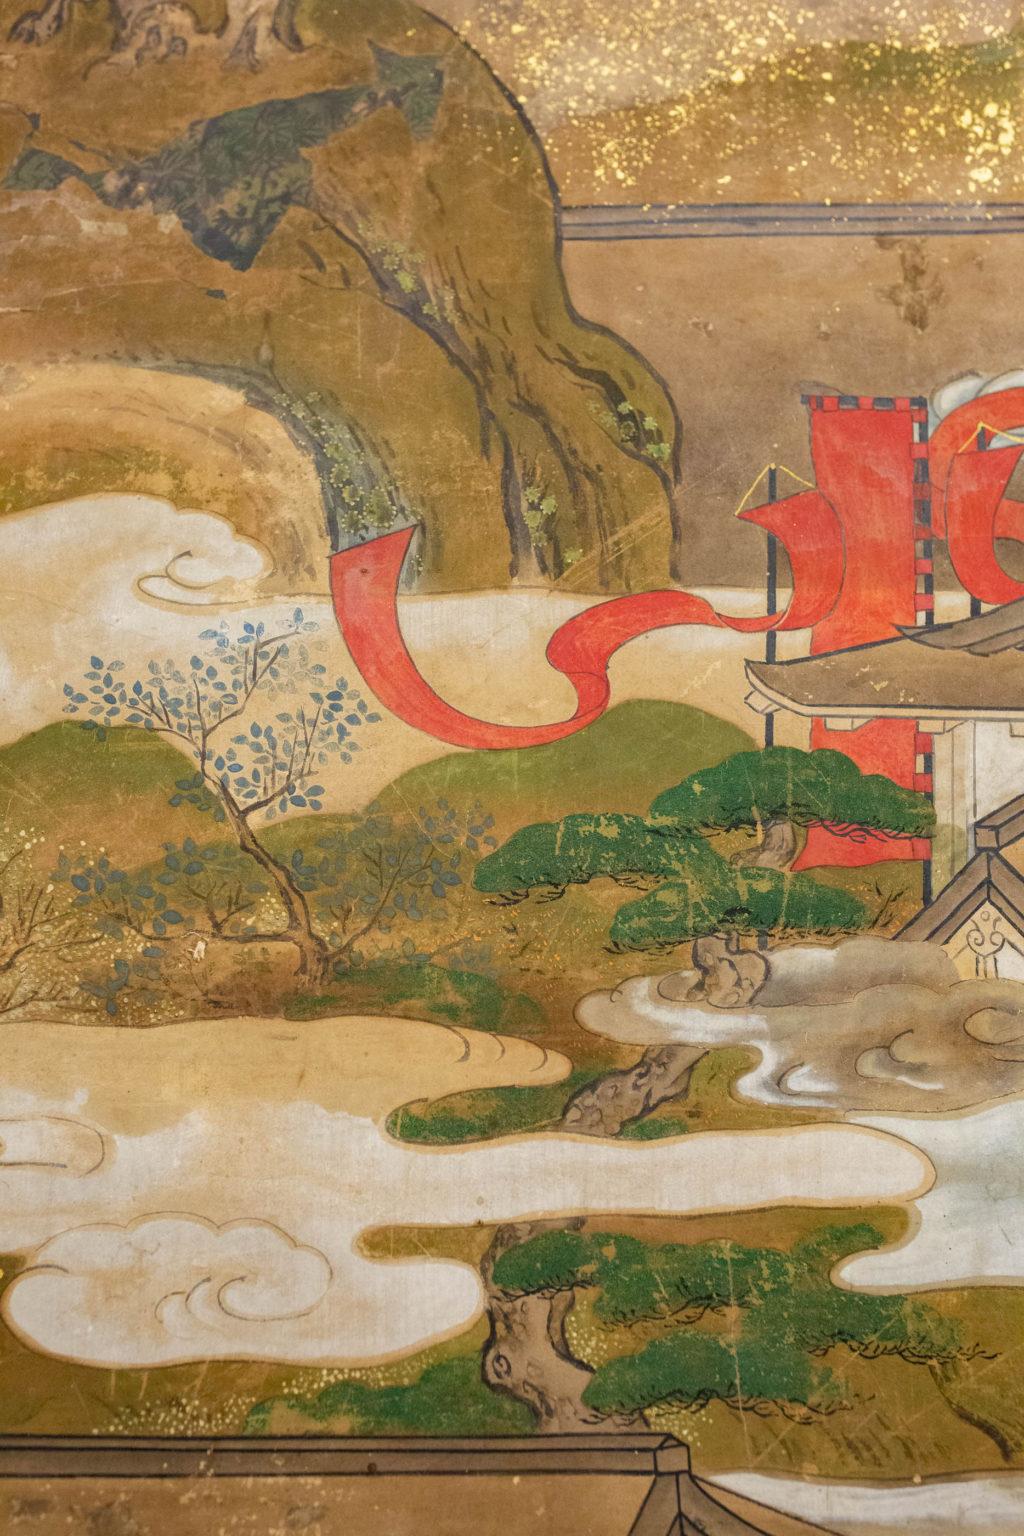 Japanese Six Panel Screen: Tosa School Painting of the Battle of Ichinotani